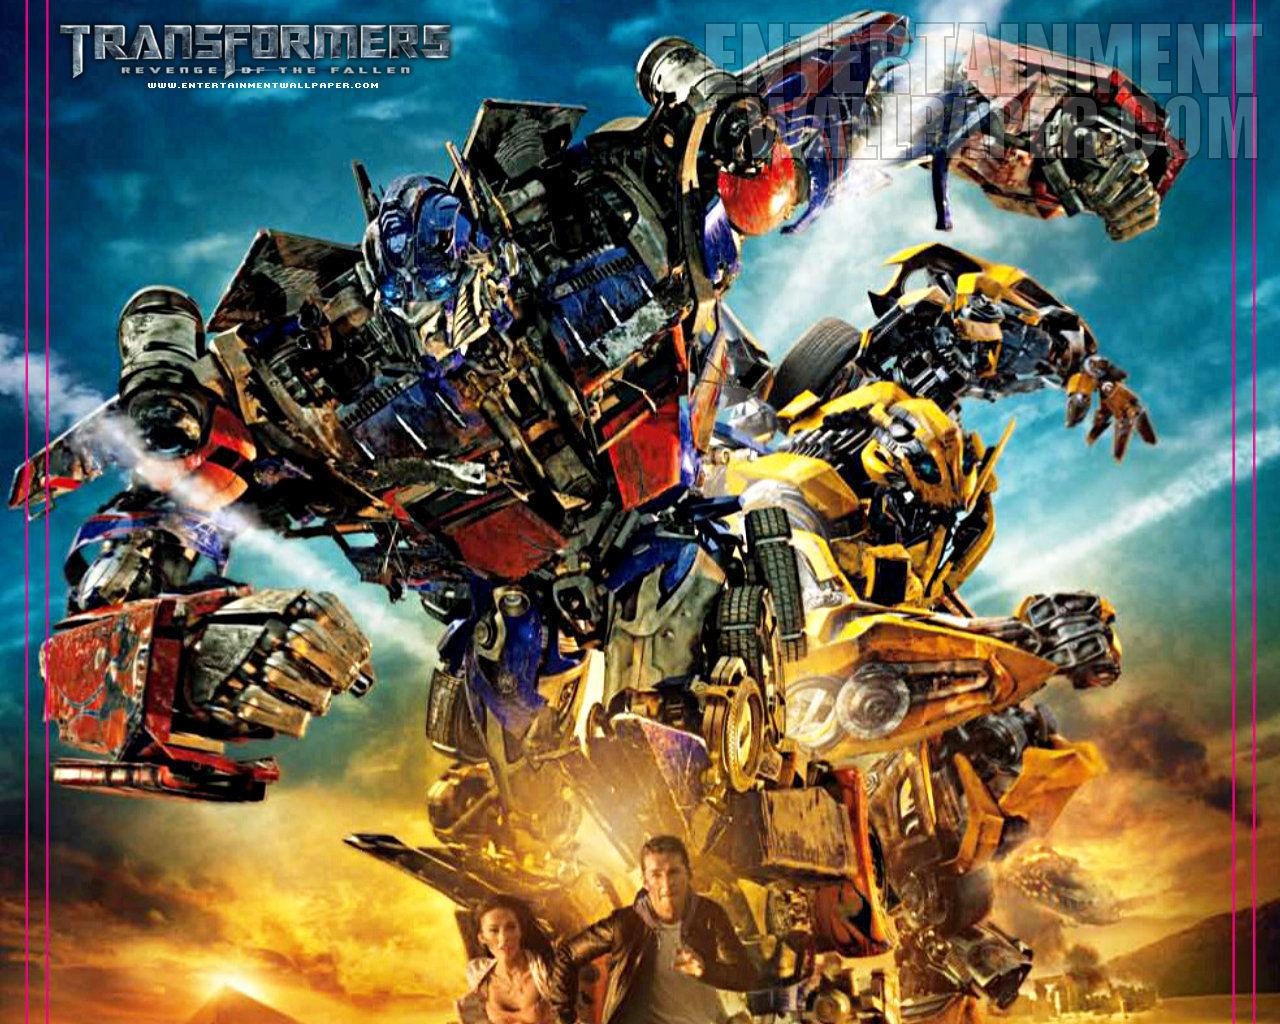 http://1.bp.blogspot.com/--n5jeowlfaA/UW9iV_uOjrI/AAAAAAAAroQ/A8xVbPwEnko/s1600/Transformers+wallpaper+(9).jpg